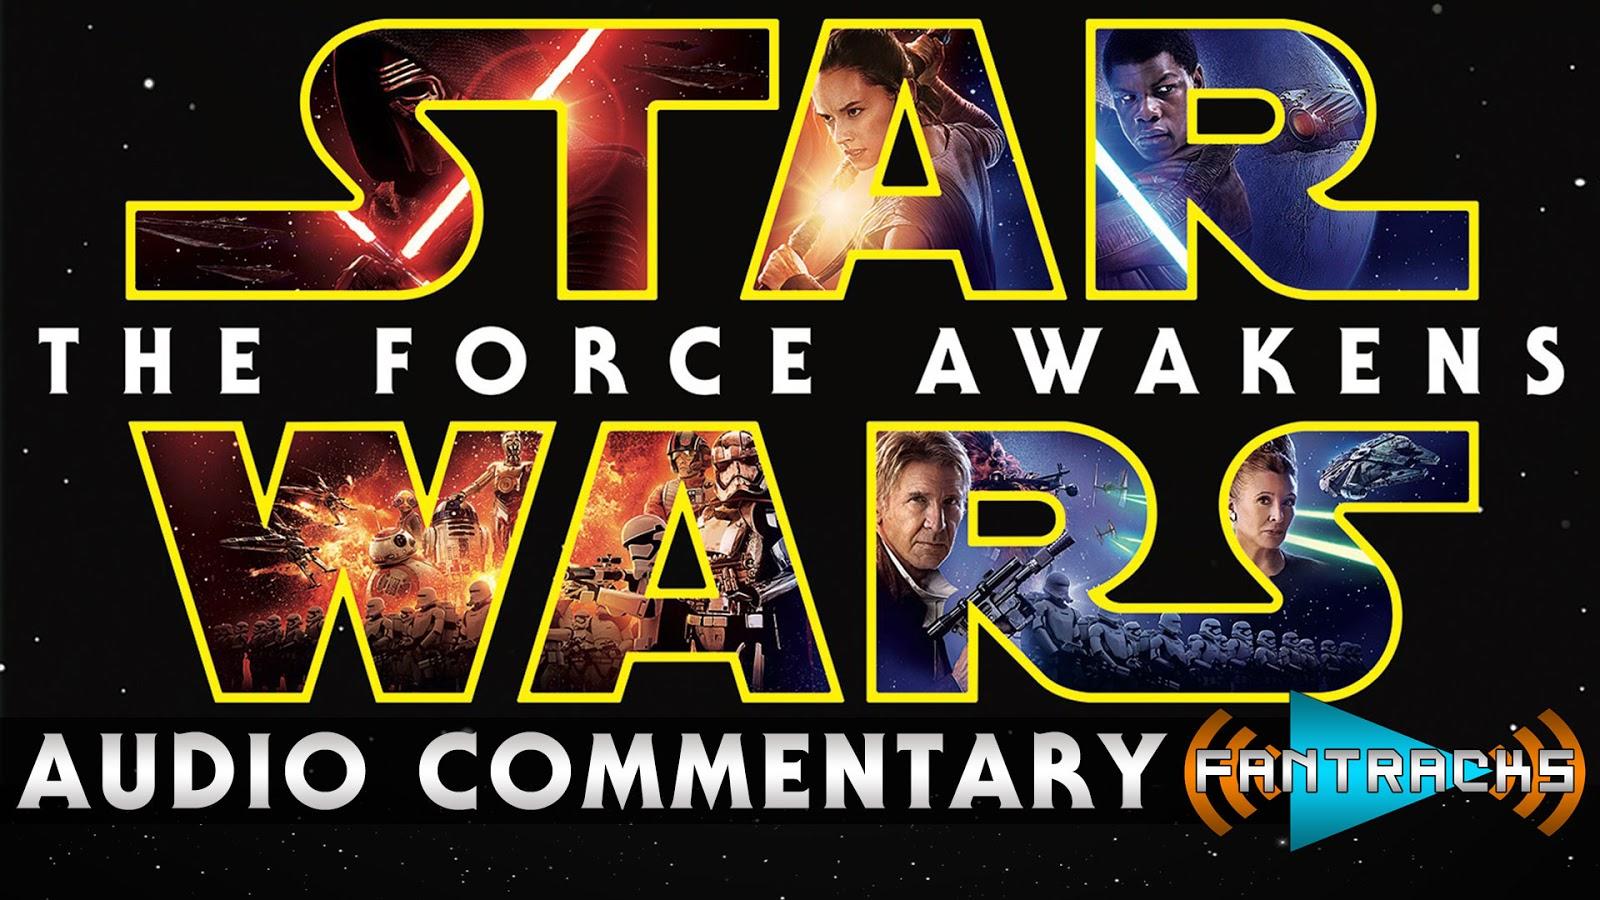 FanTracks Star Wars Episode 7 The Force Awakens audio commentary